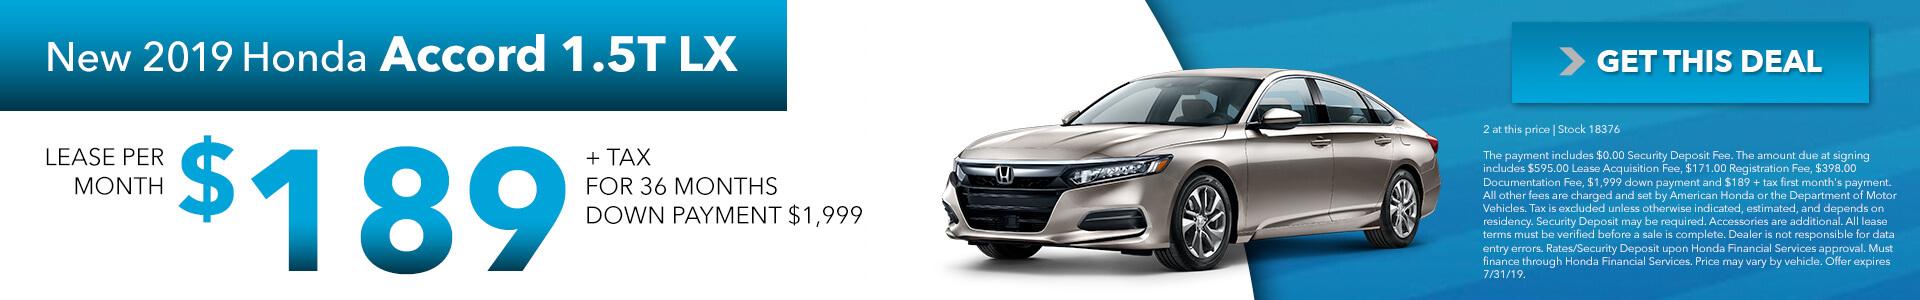 2019 Honda Accord 1.5T LX  $189 per month